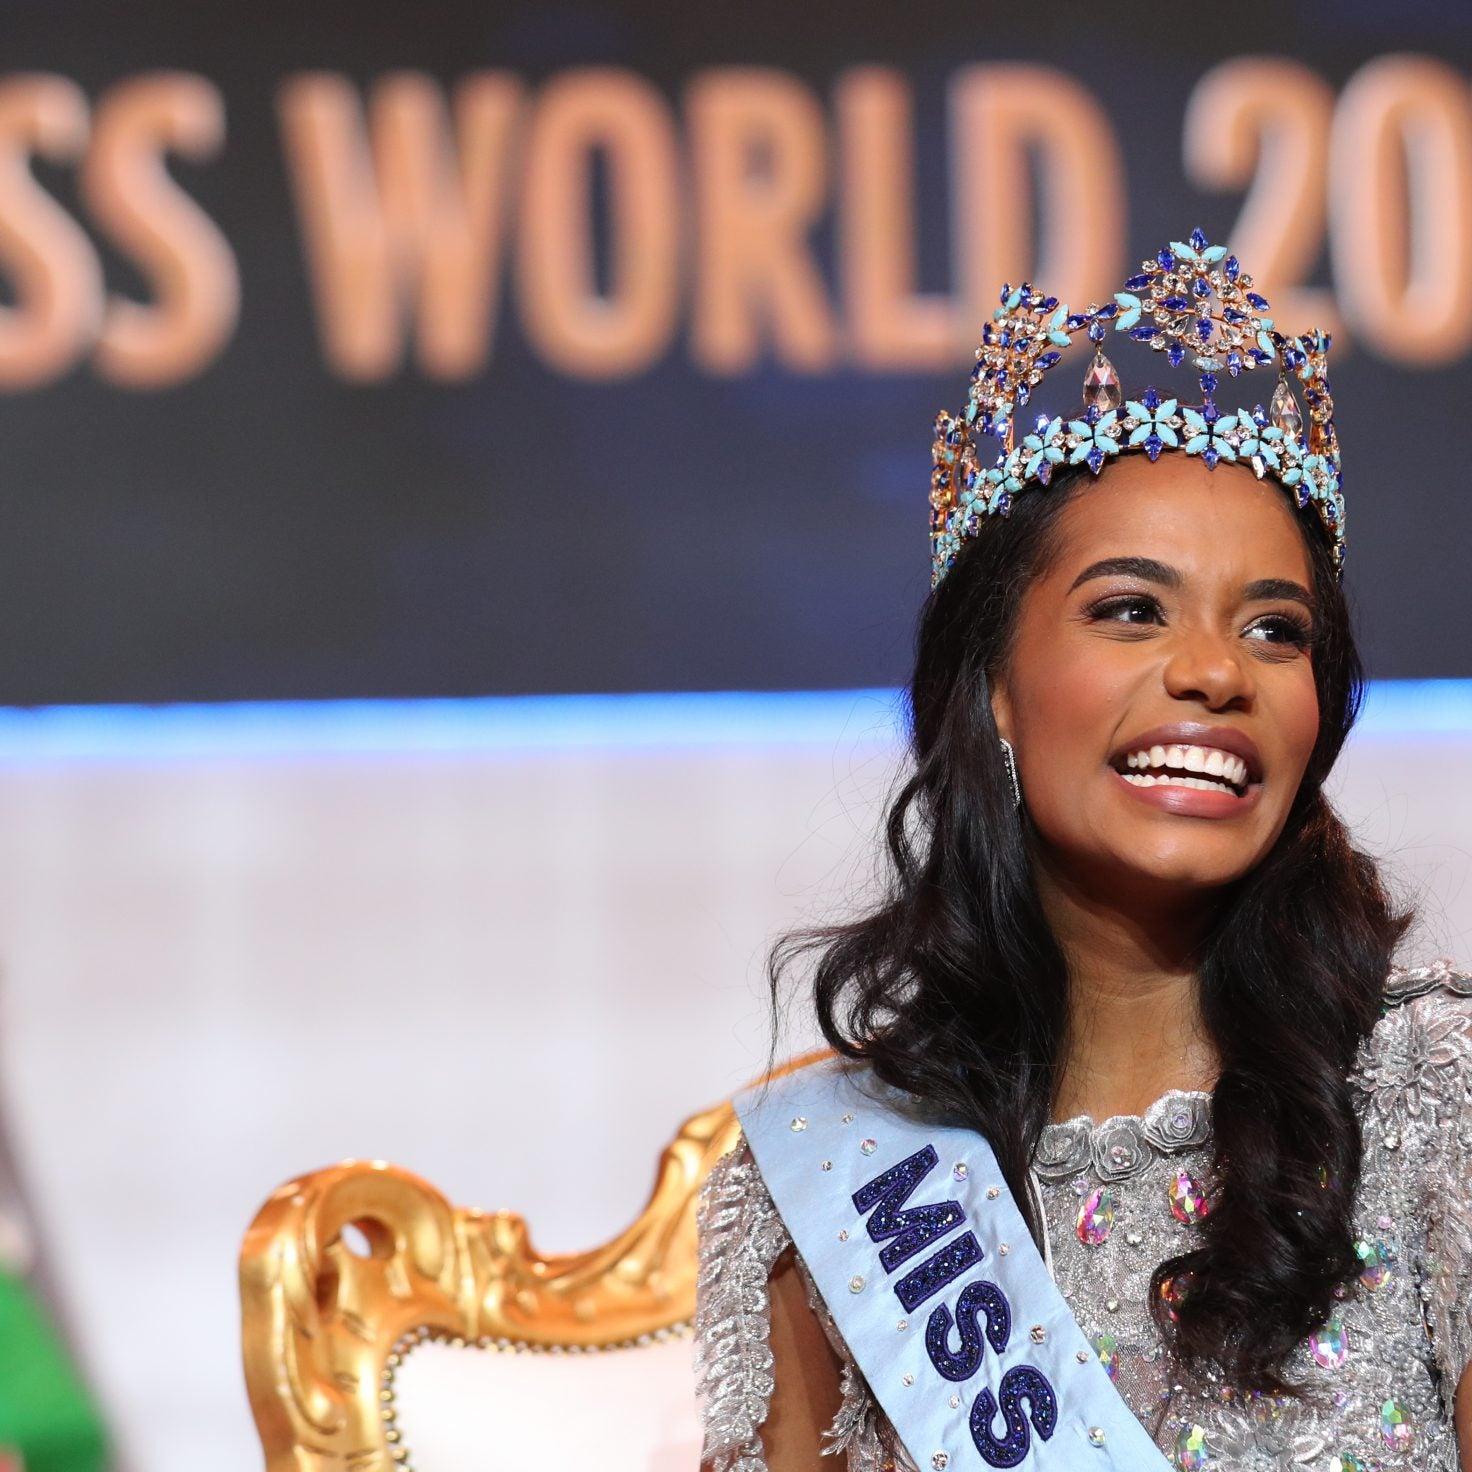 Miss Jamaica Wins Miss World 2019 Pageant!